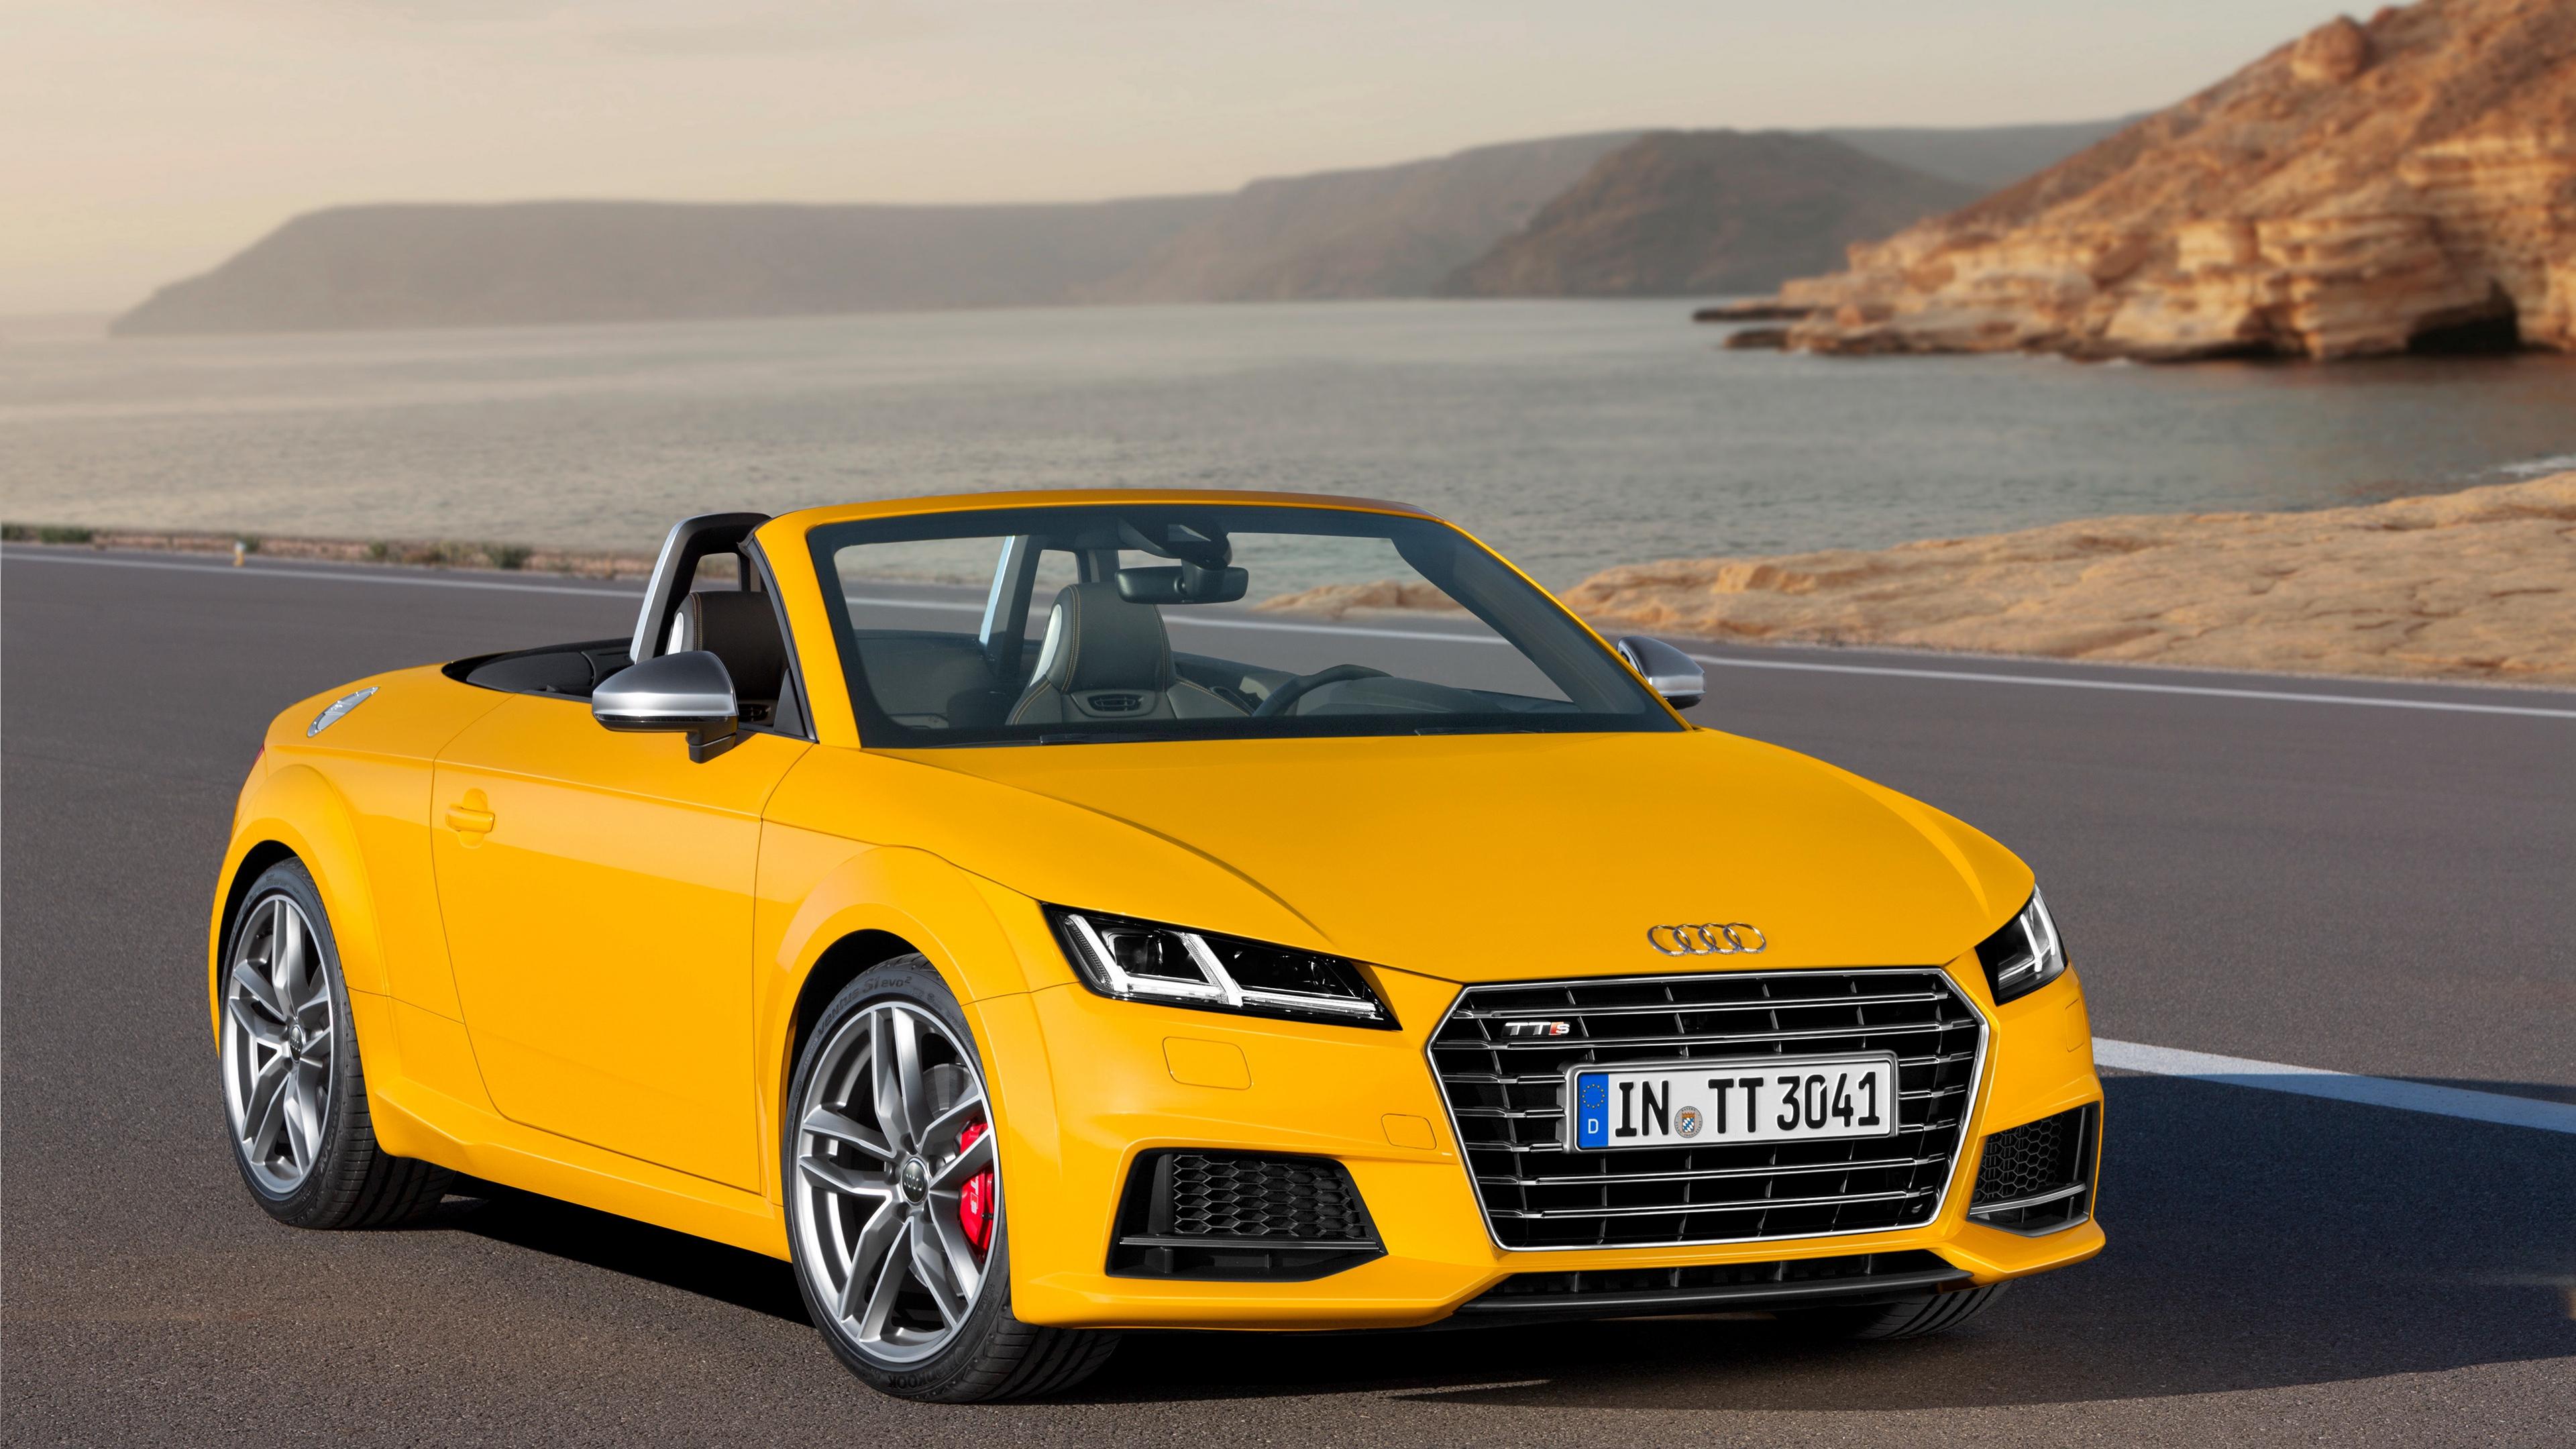 audi tts tt yellow roadster 2014 4k 1538935024 - audi, tts, tt, yellow, roadster, 2014 4k - tts, tt, Audi